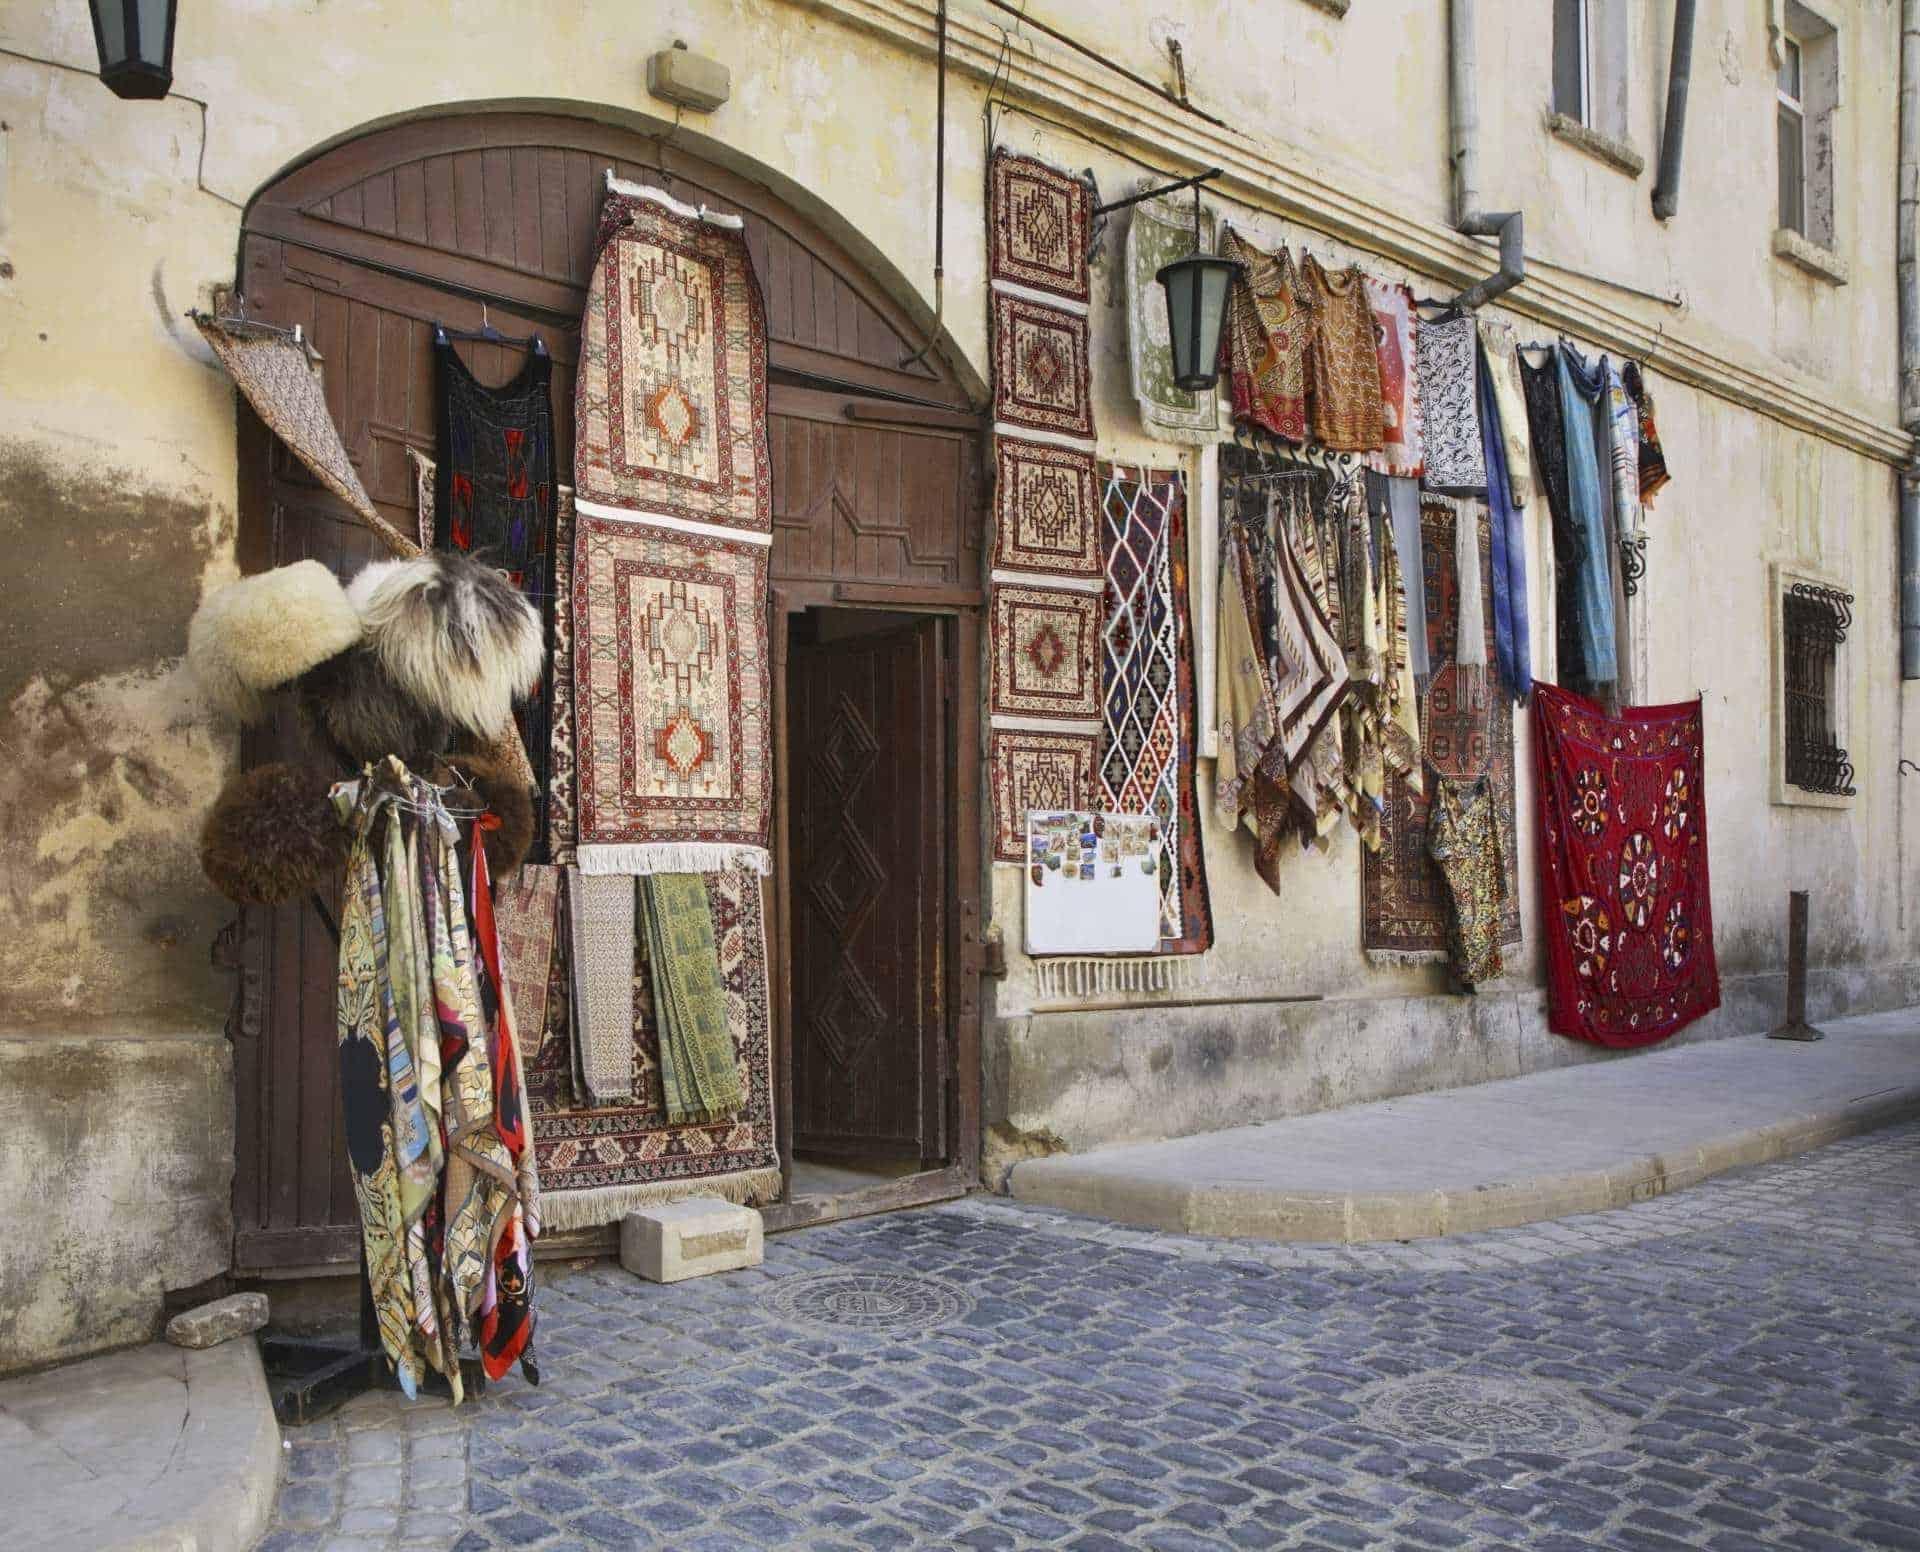 Old town, baku, azerbaijan, caucasus